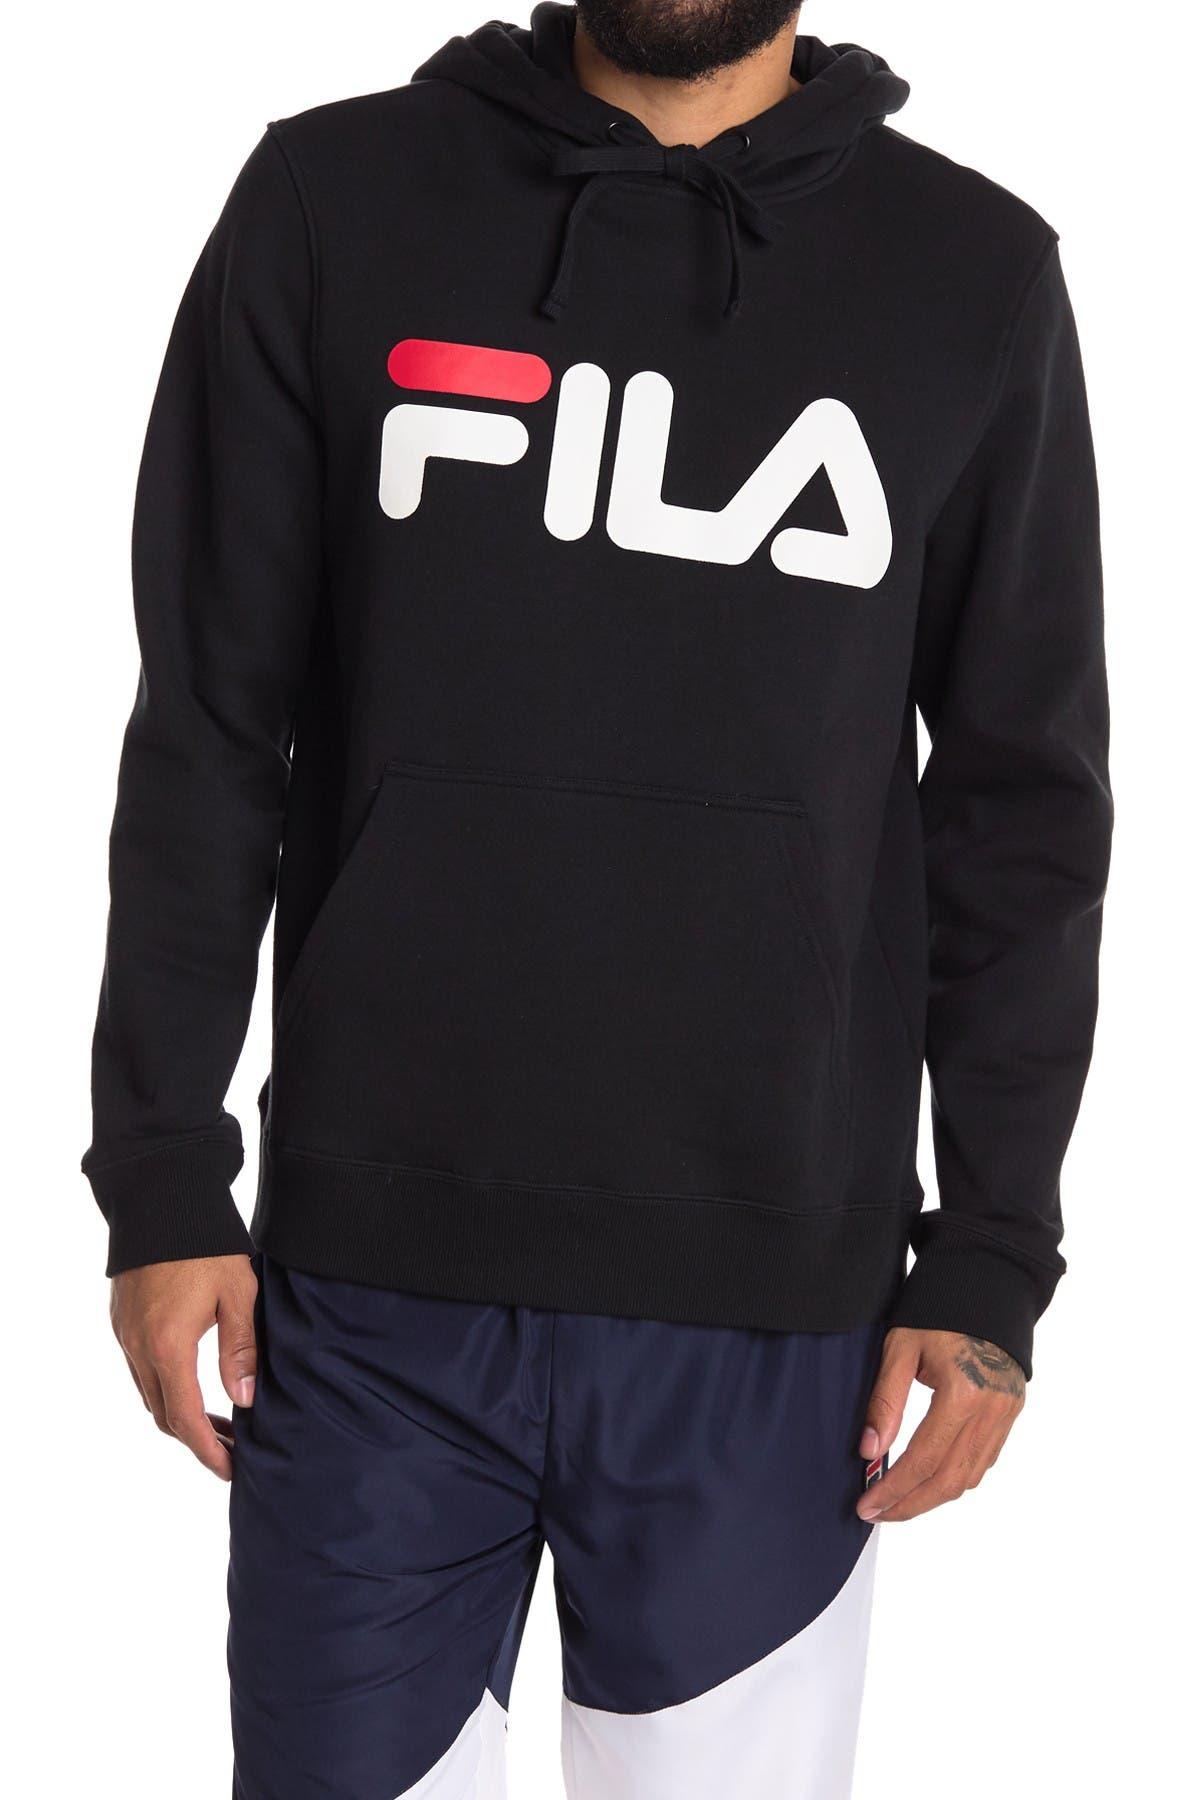 Image of FILA USA Logo Graphic Drawstring Hoodie